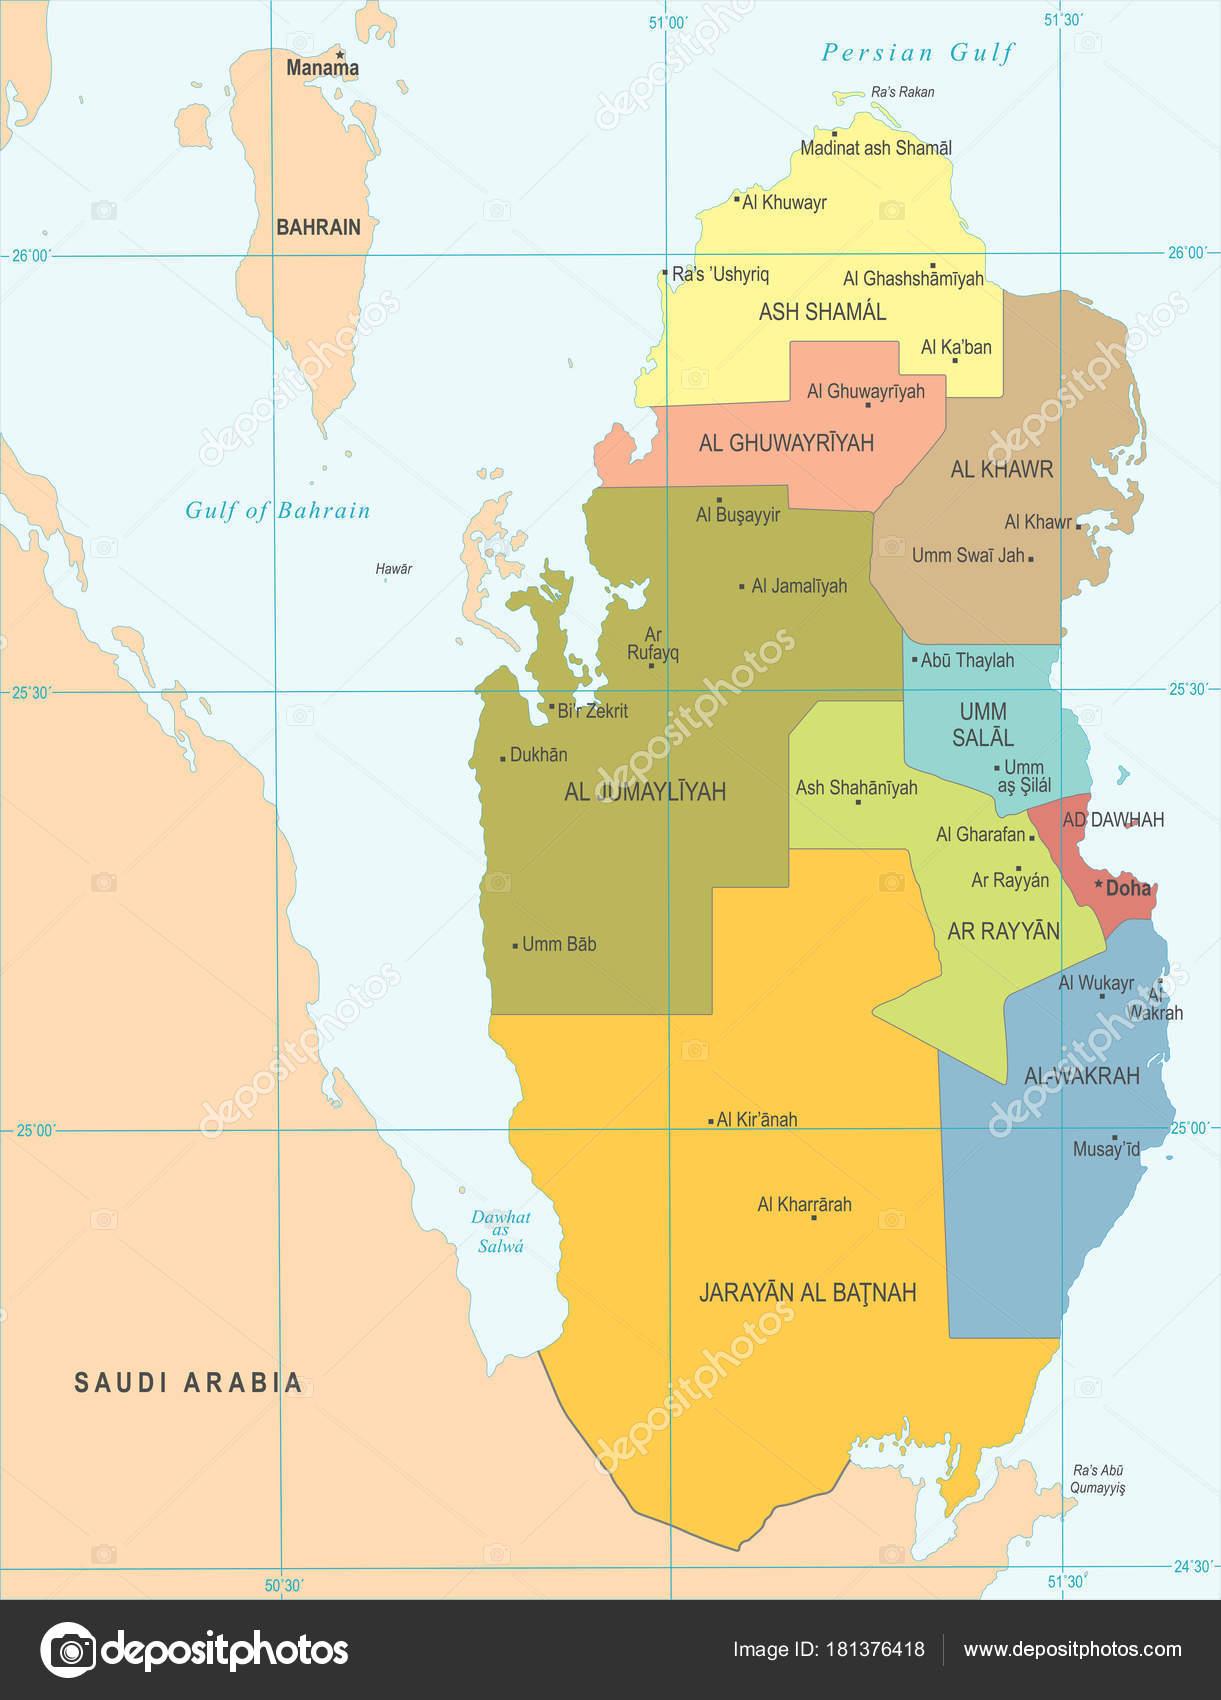 katar landkarte Katar Landkarte   detaillierte Vektor Illustration — Stockvektor  katar landkarte